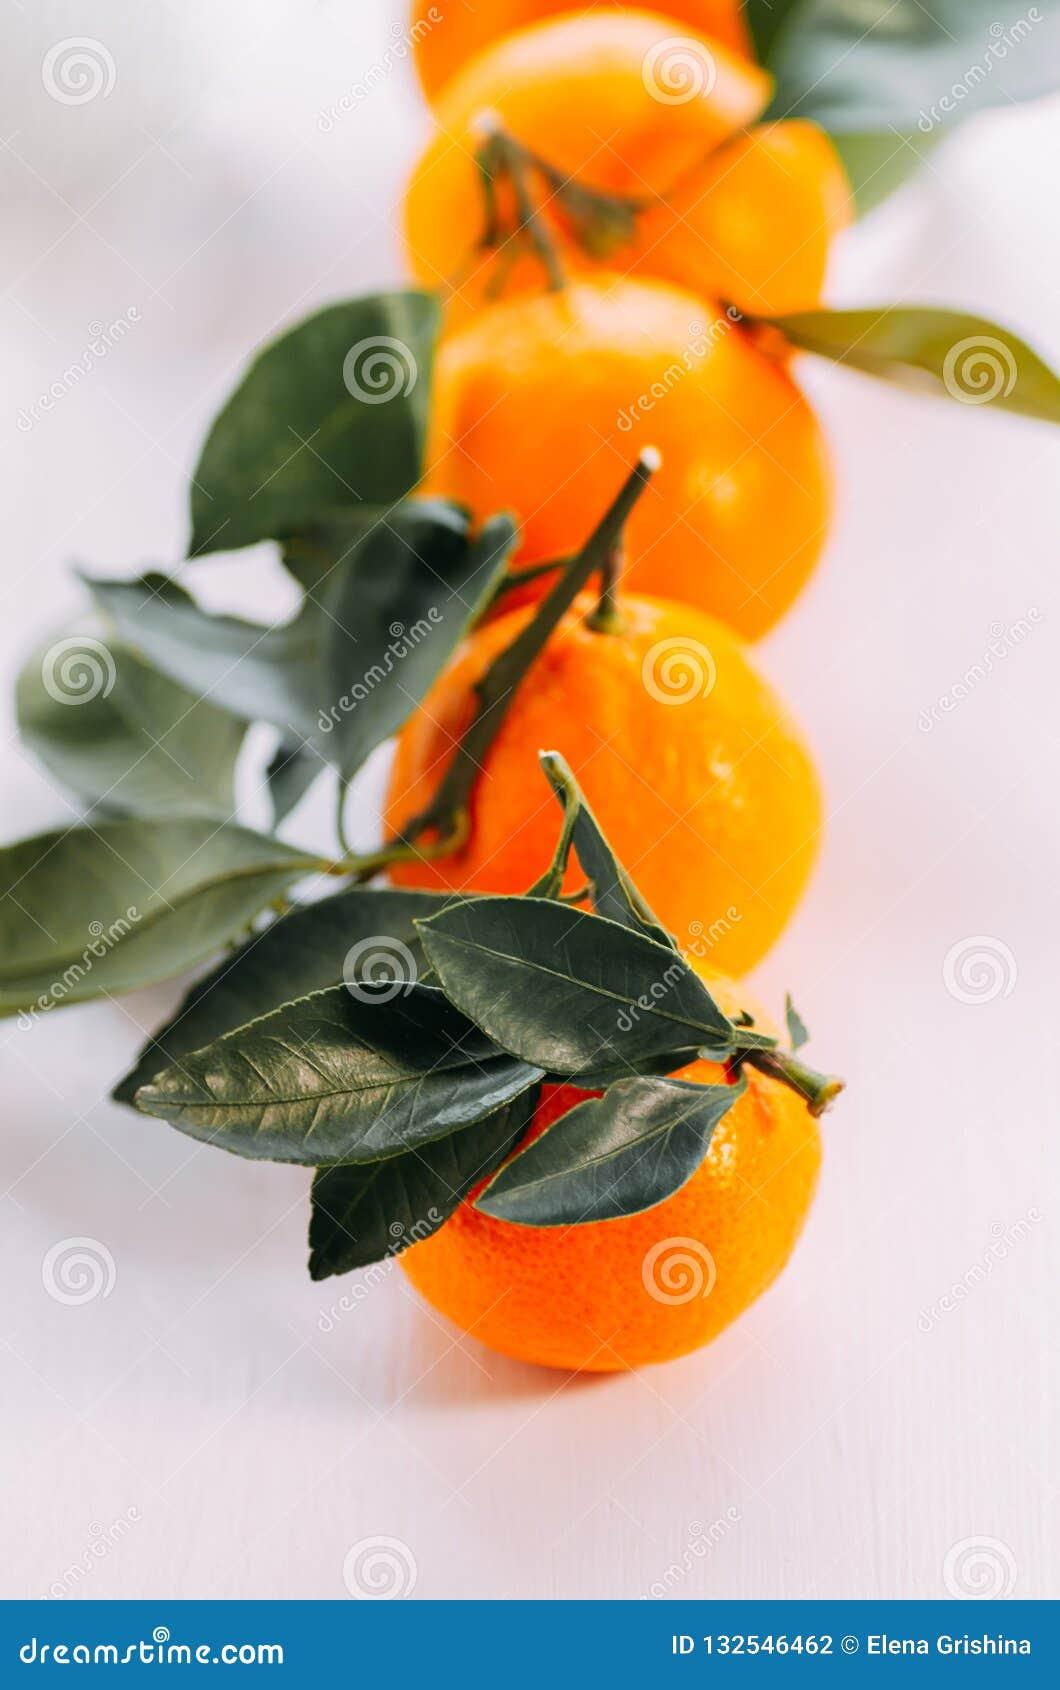 Mandarín fresco anaranjado maduro en un fondo blanco Cinco mandarinas con verde en un fondo blanco